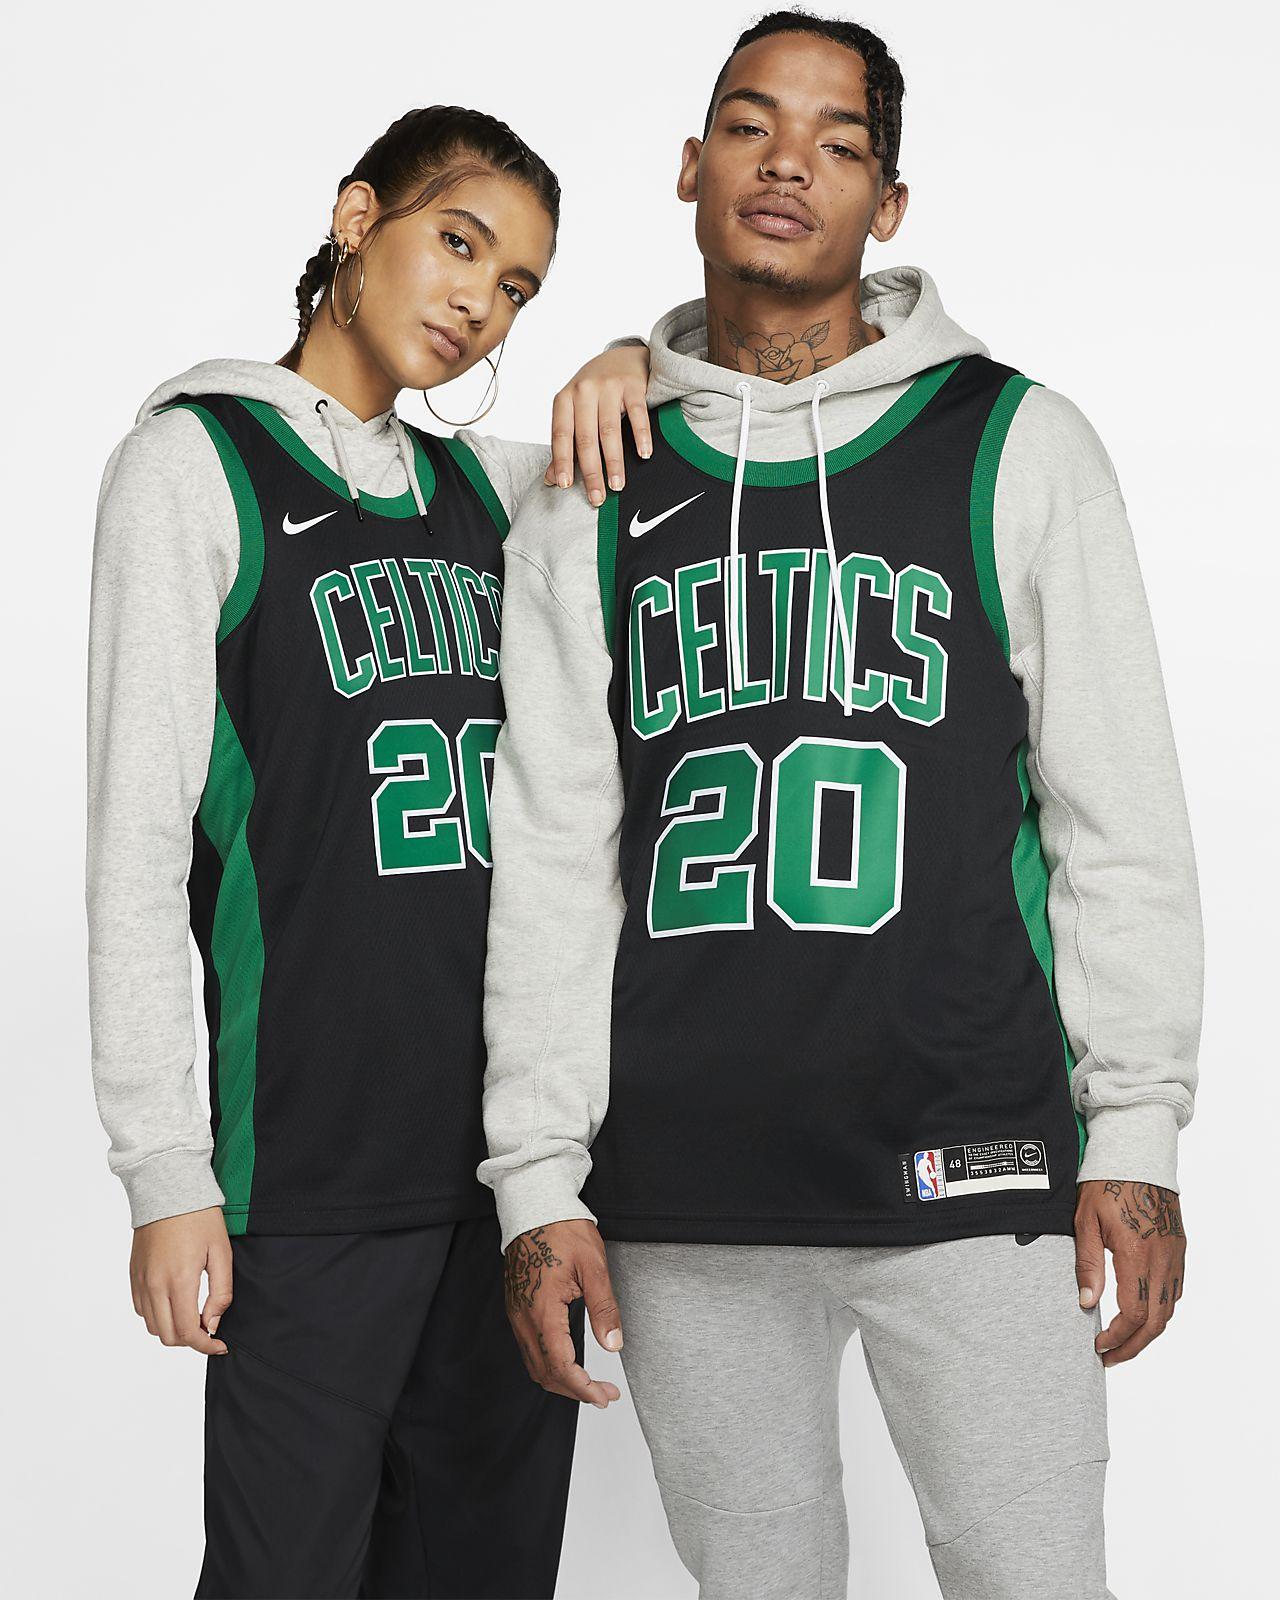 bb52b6a0b36 ... Gordon Hayward Statement Edition Swingman (Boston Celtics) Nike NBA  connected jersey voor heren